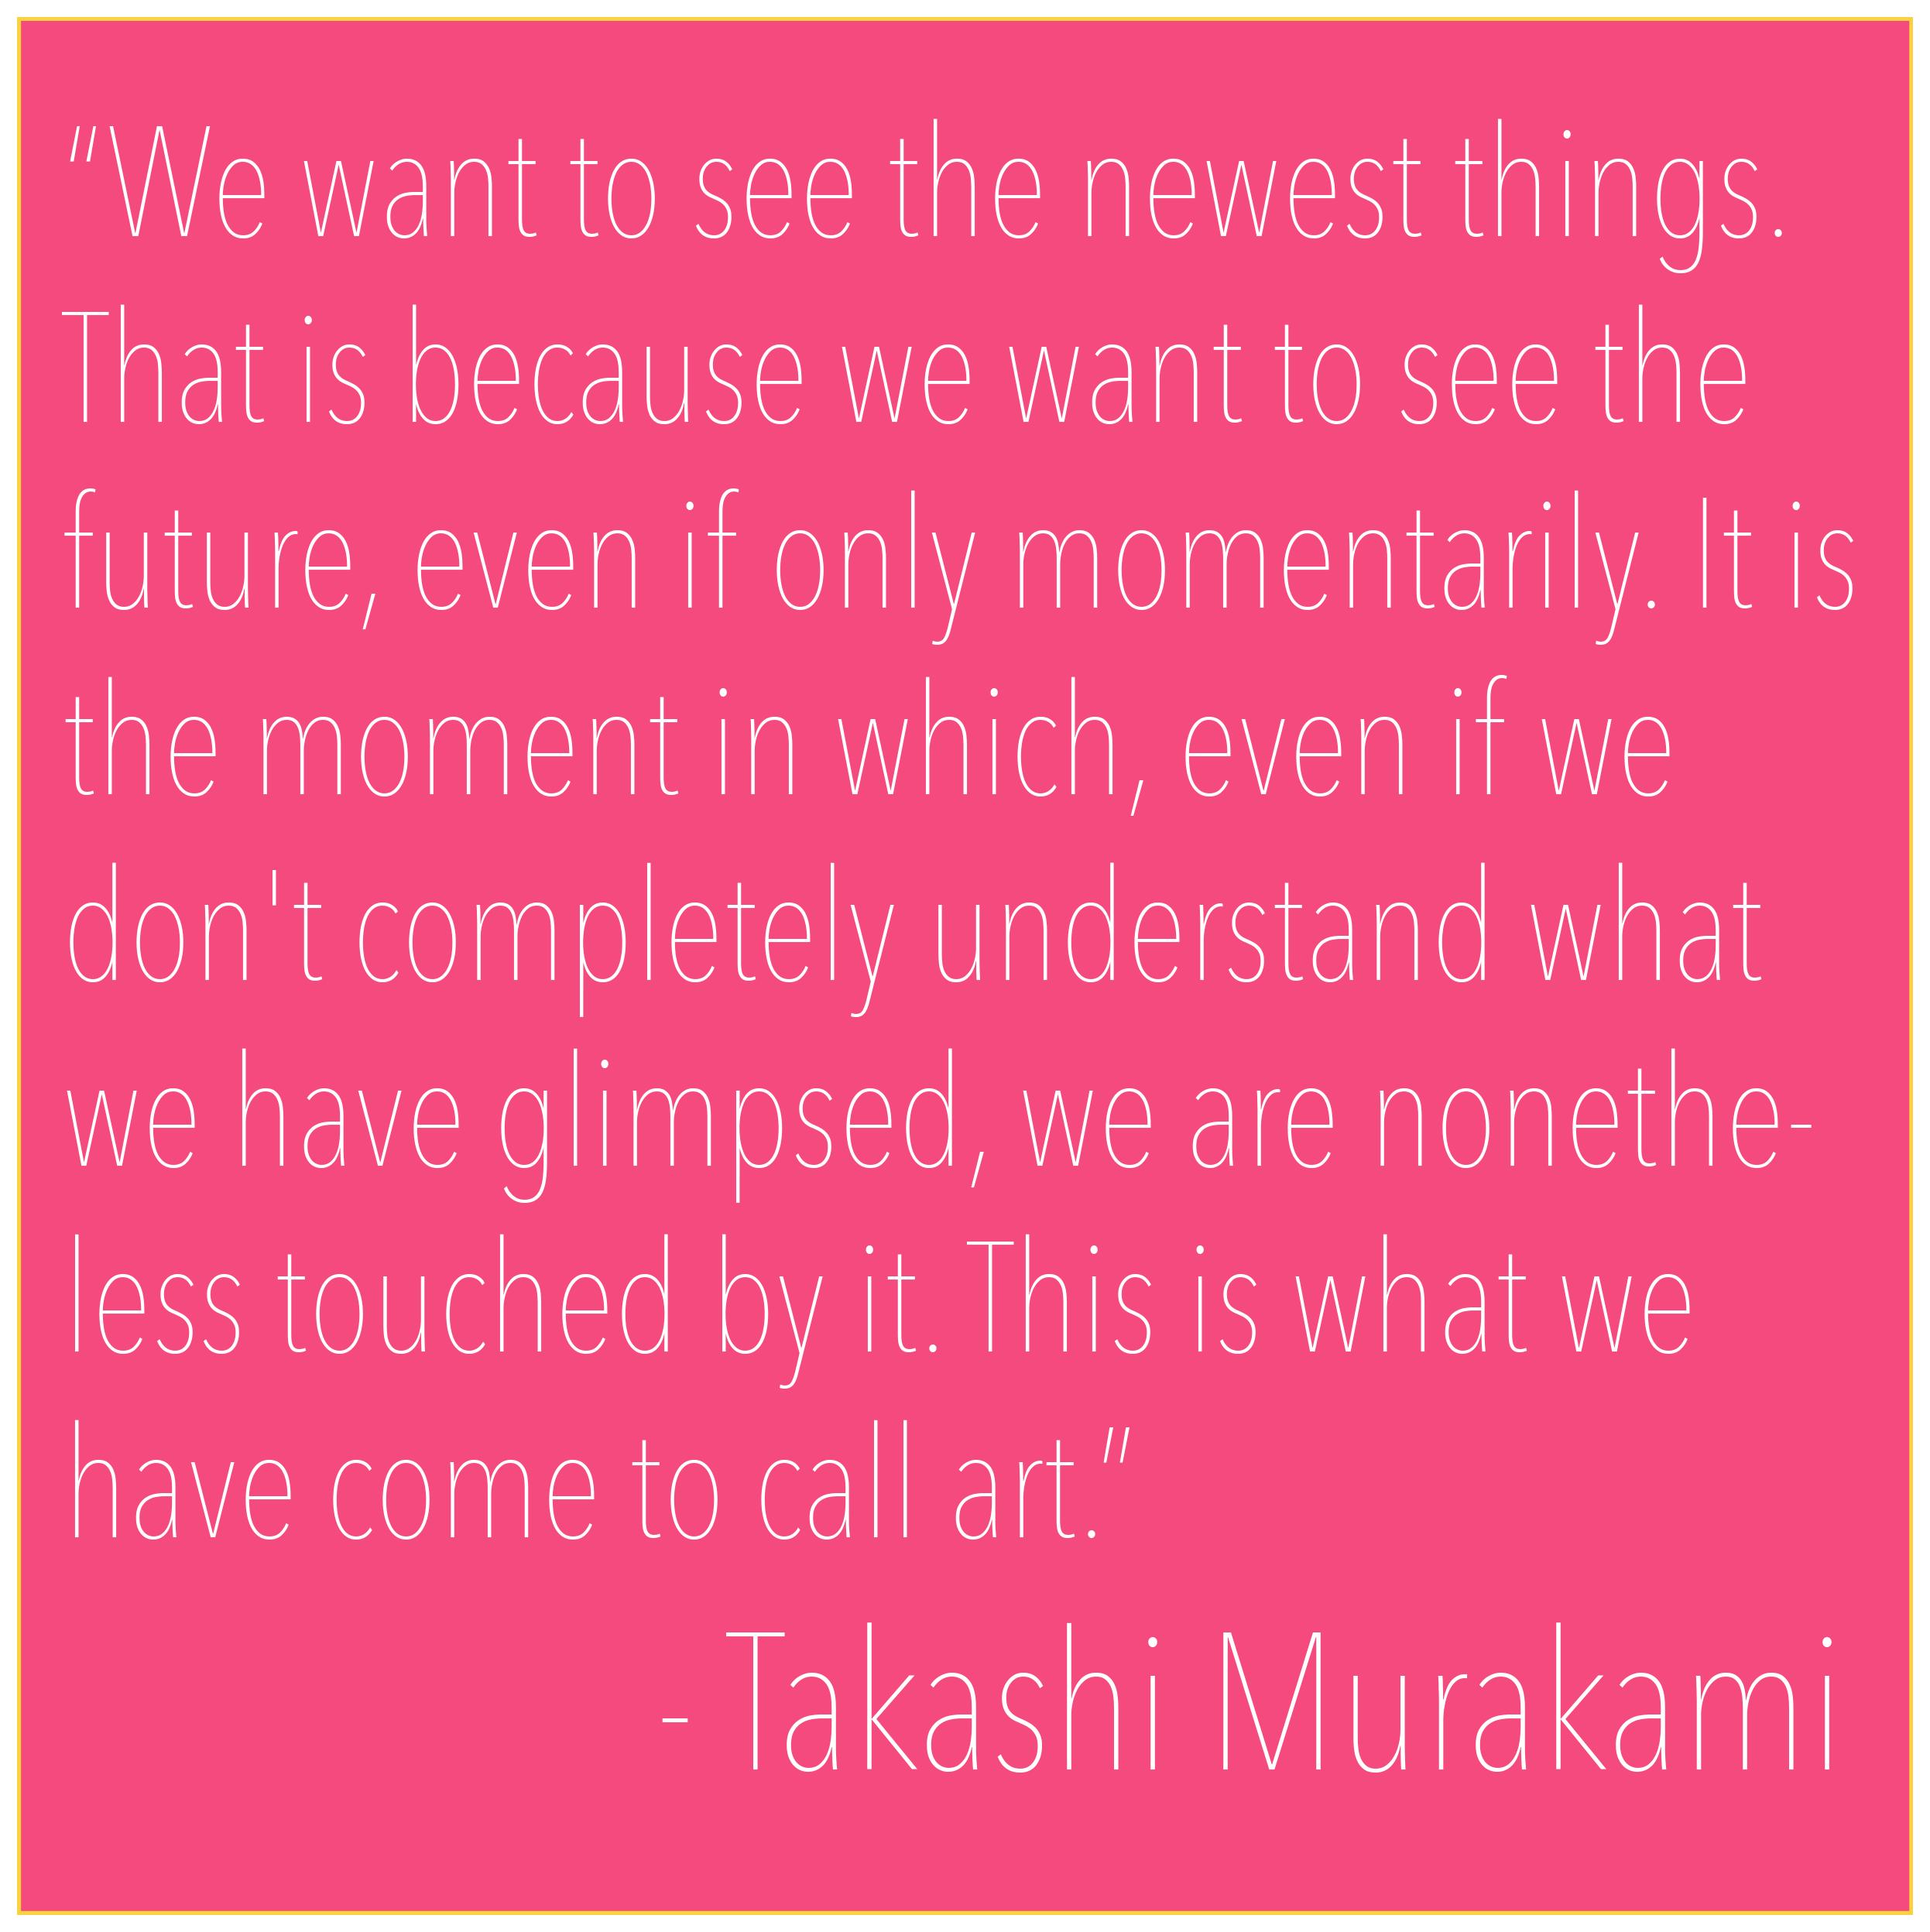 Takashi Murakami Quotes. QuotesGram